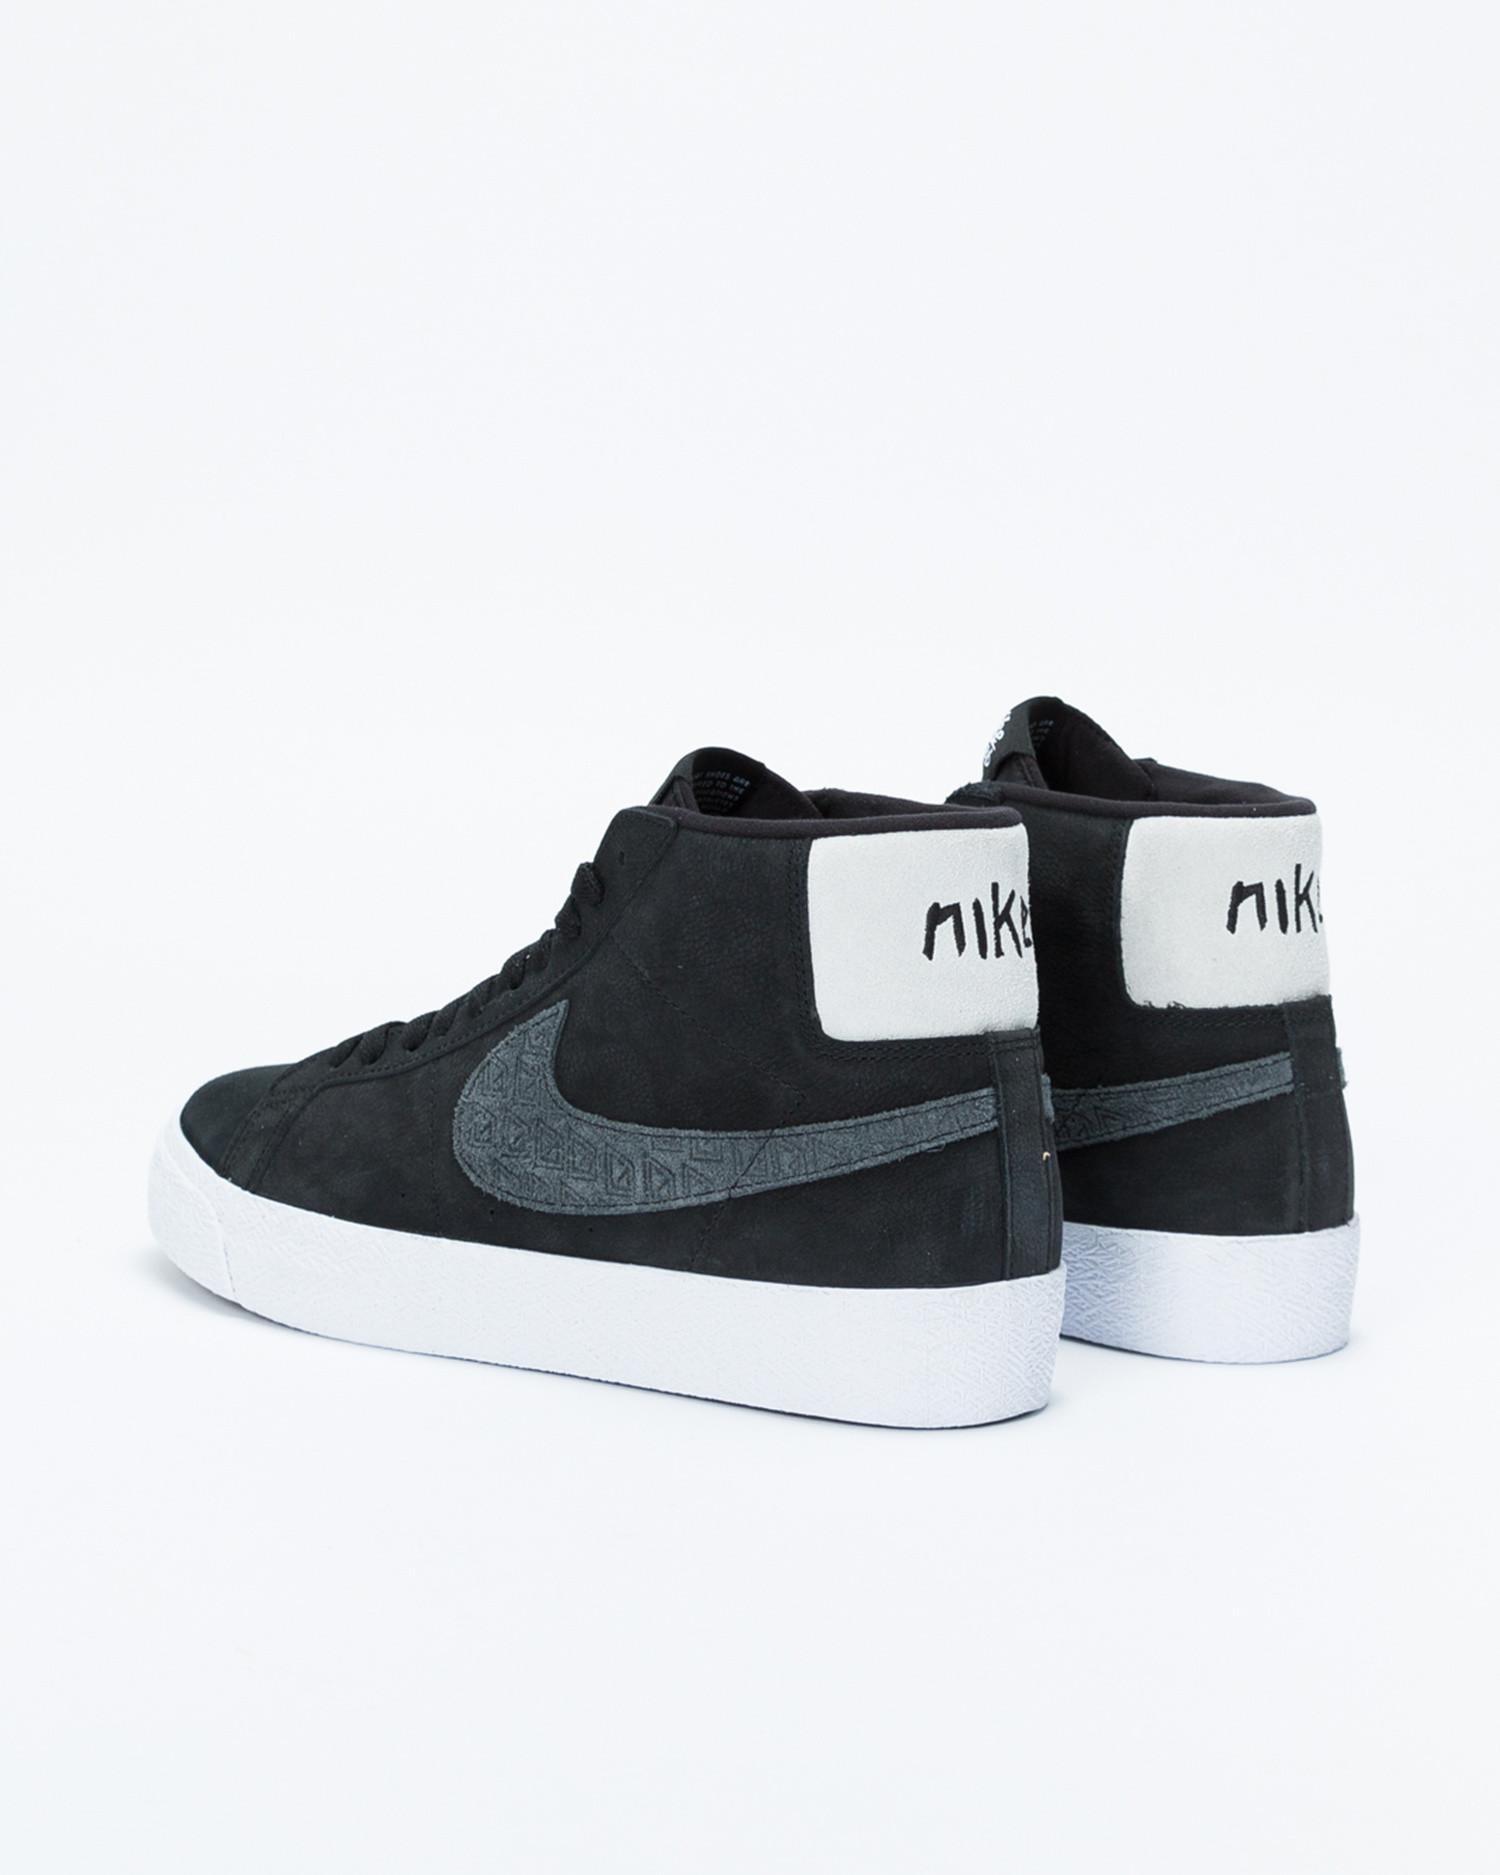 detailed look 6f2fd 9f055 Nike Zoom Blazer Mid QS